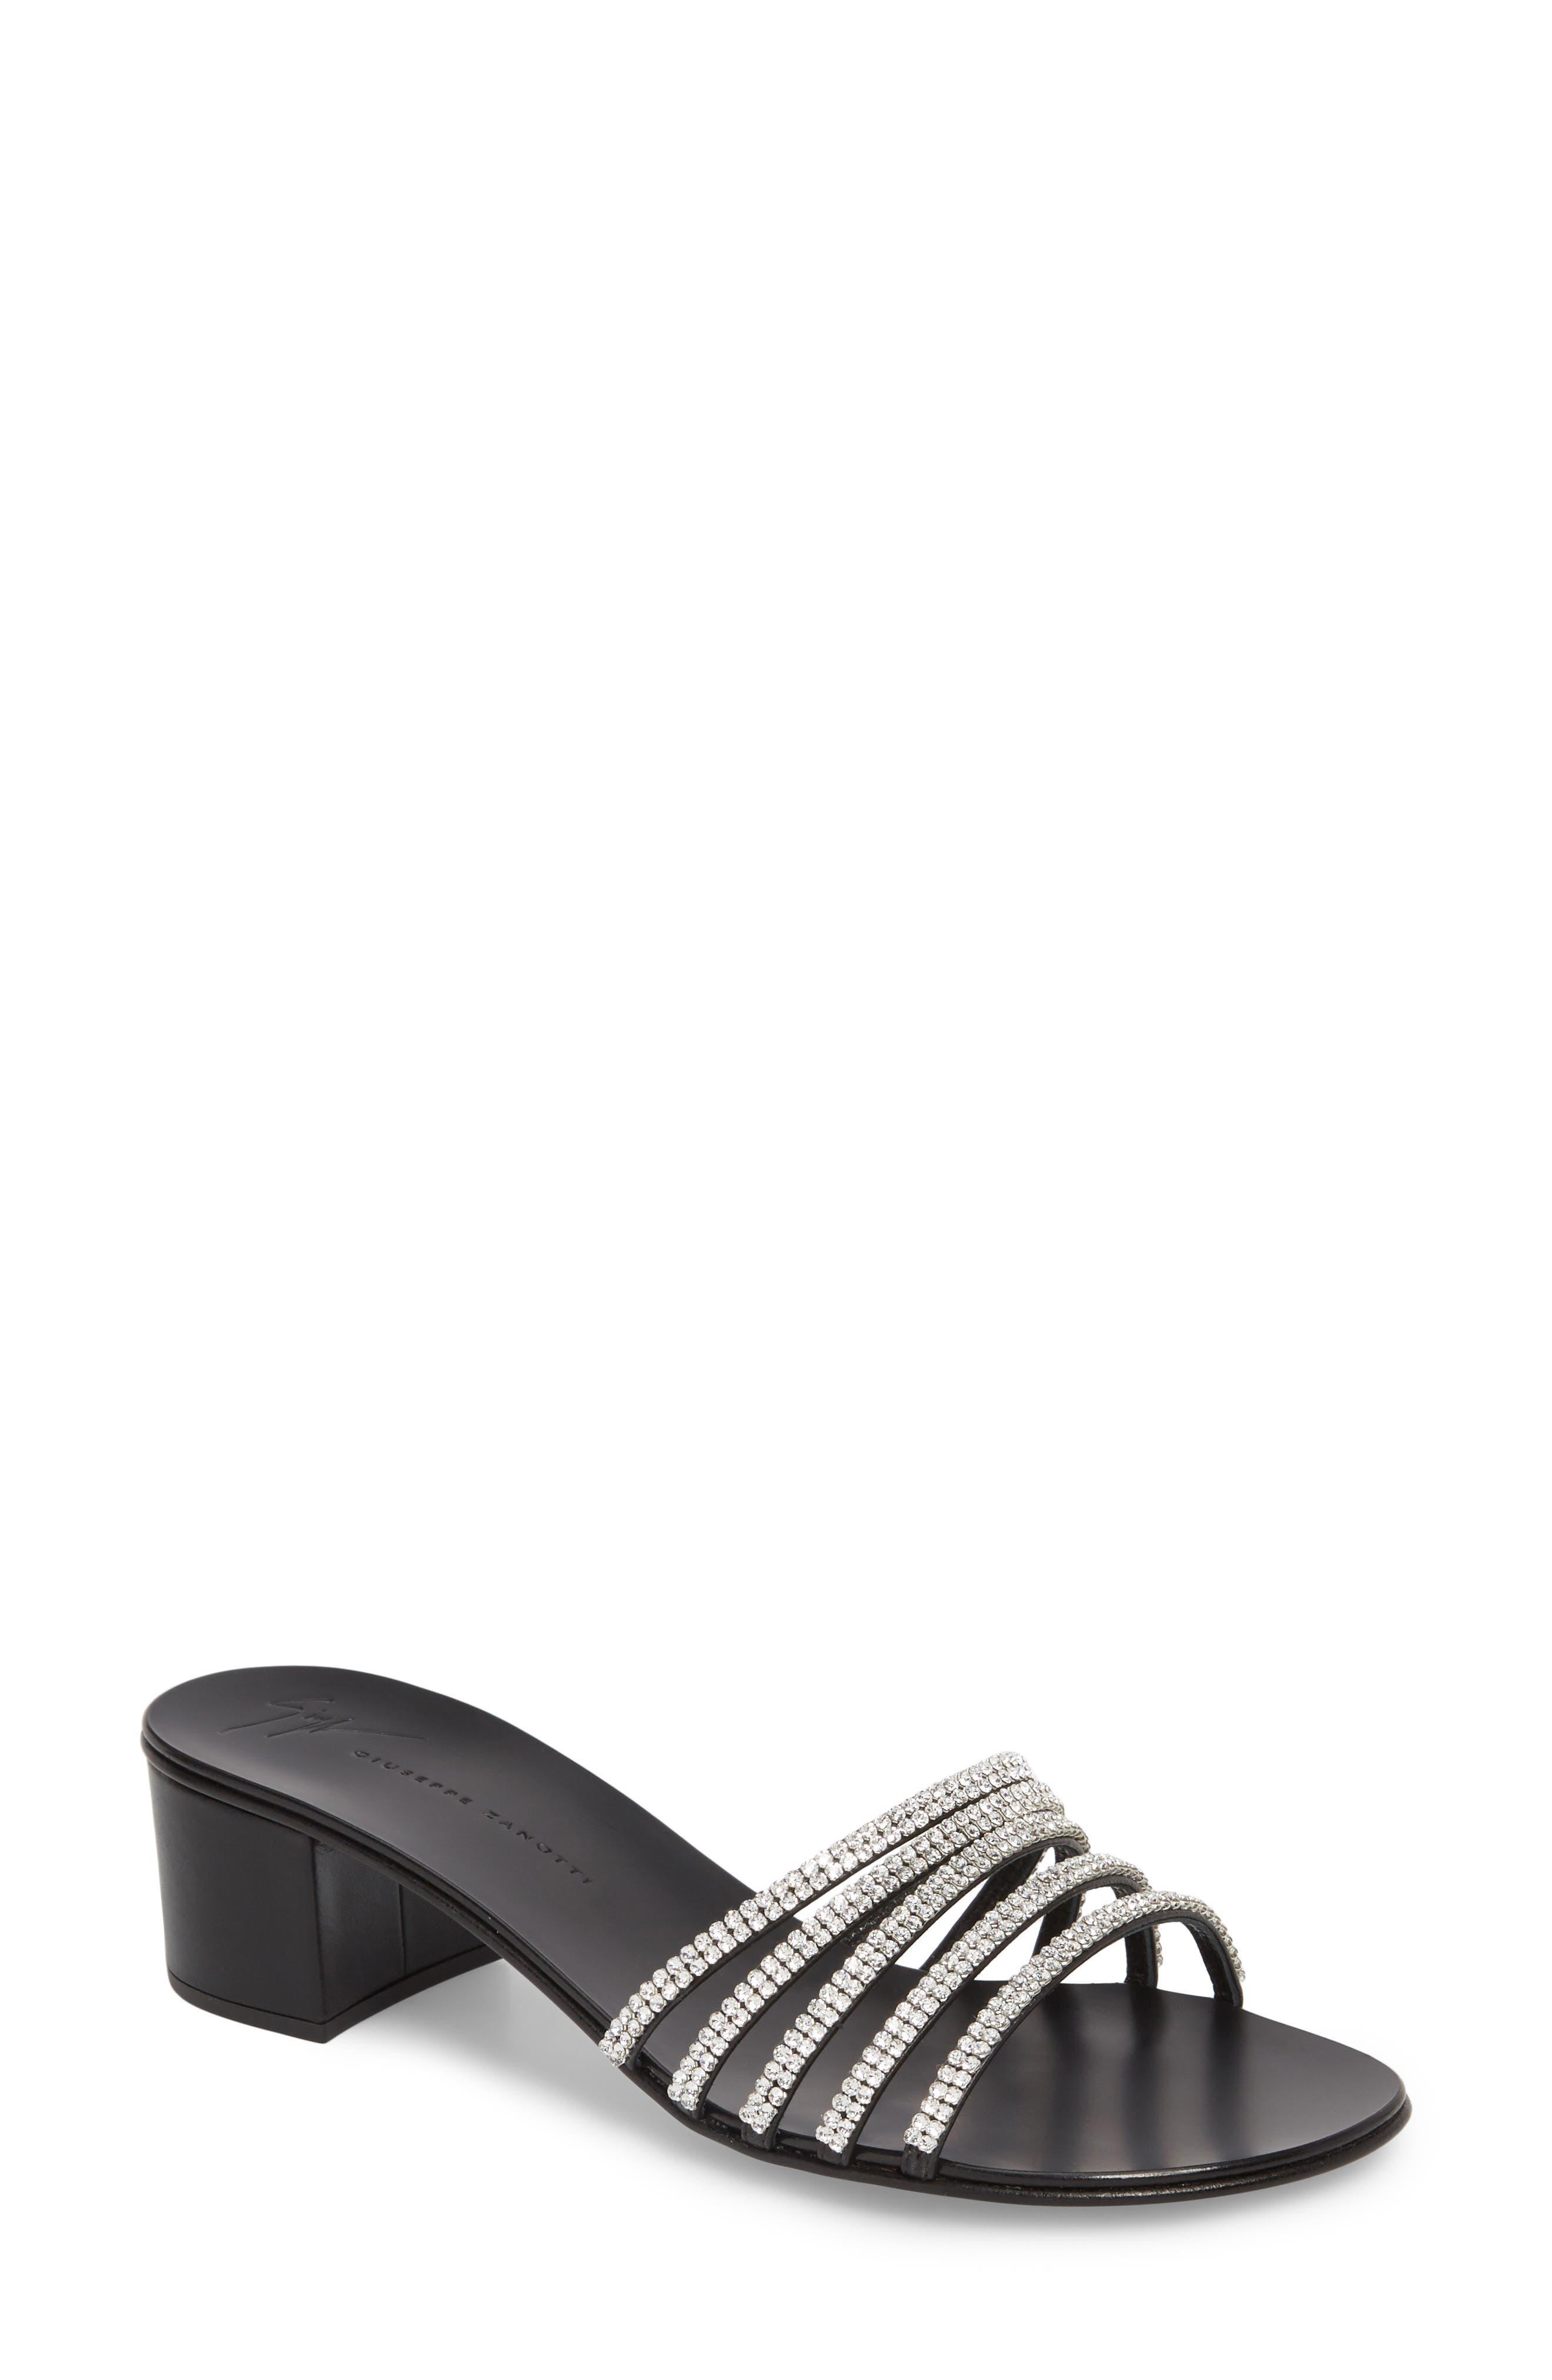 Swarovski Crystal Slide Sandal,                             Main thumbnail 1, color,                             BLACK